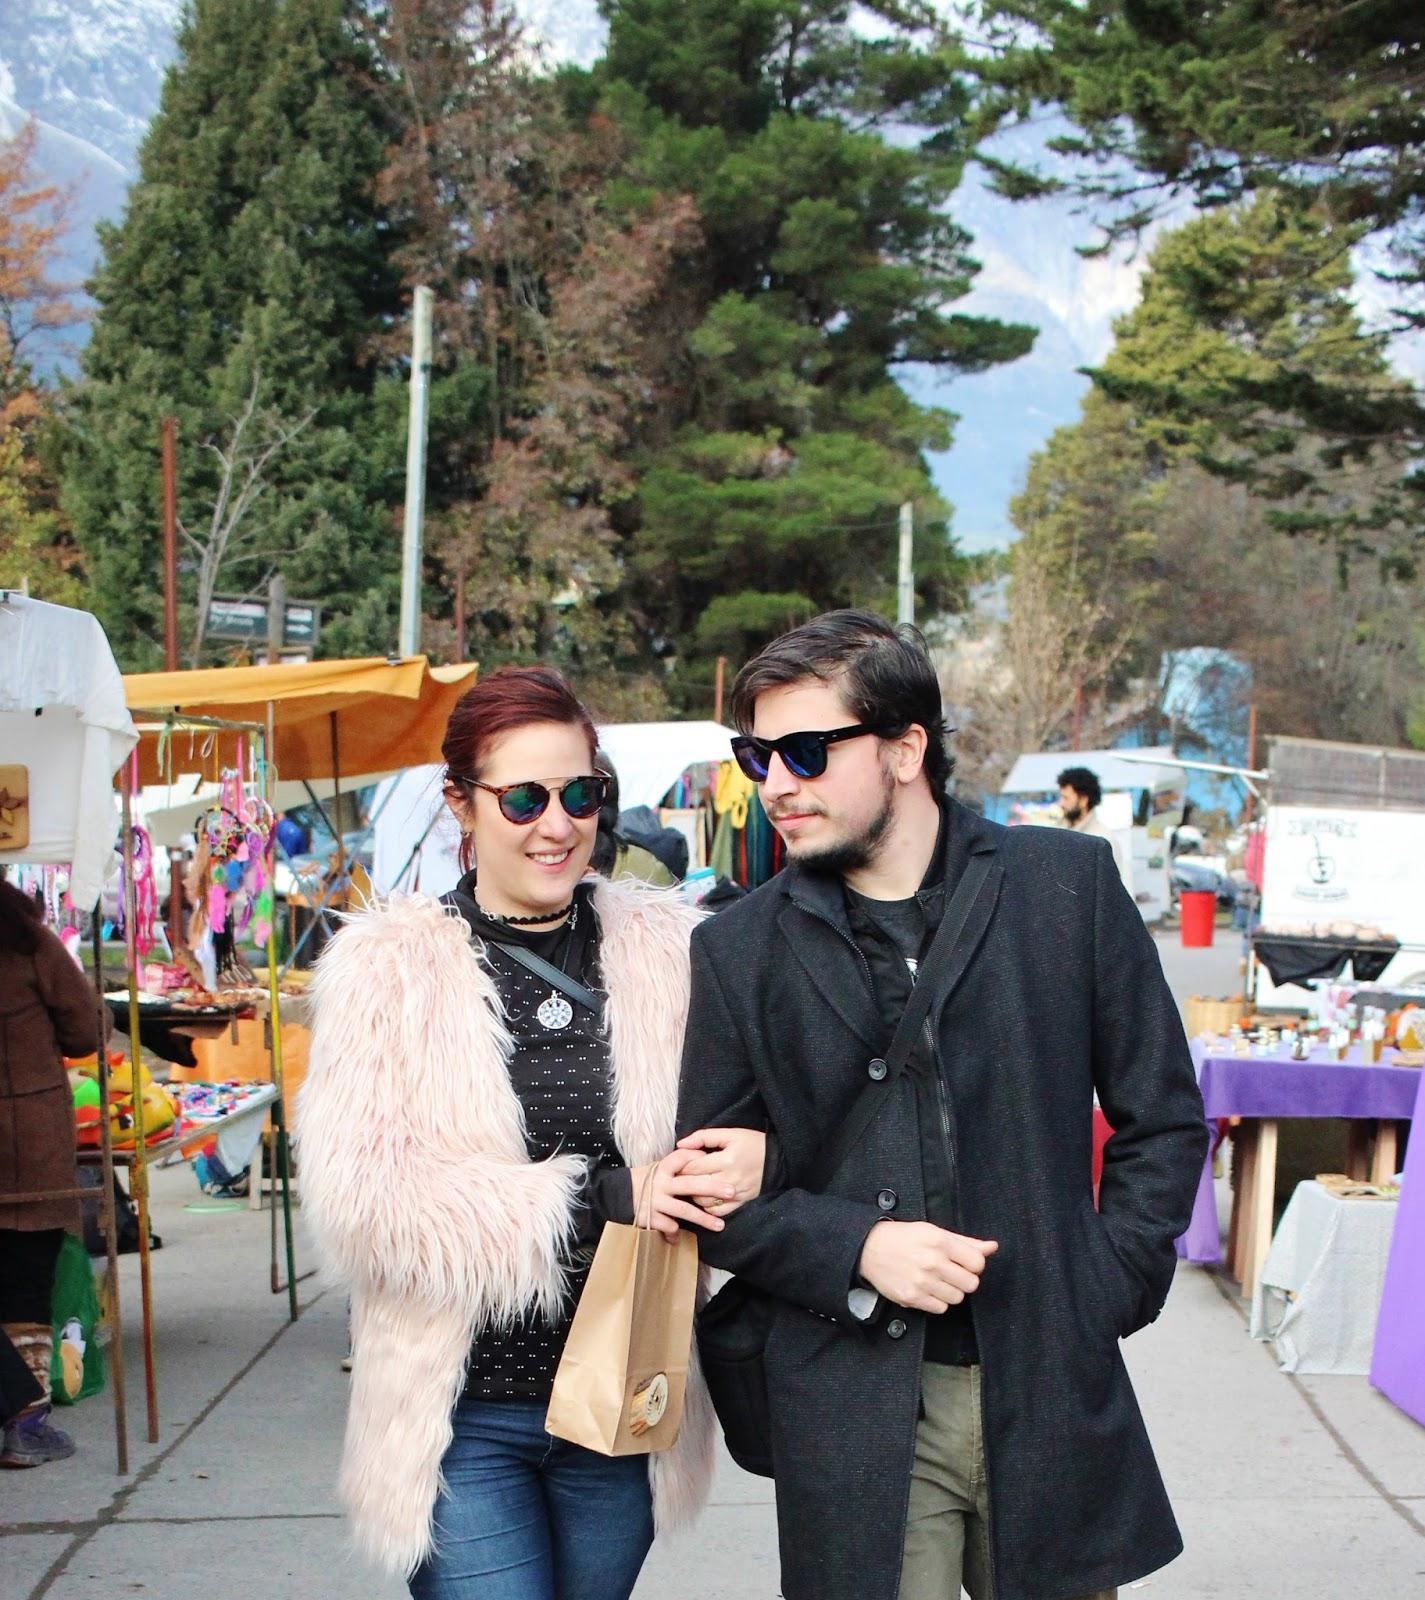 Feria Artesanal EL BOLSON - Patagonia Argentina